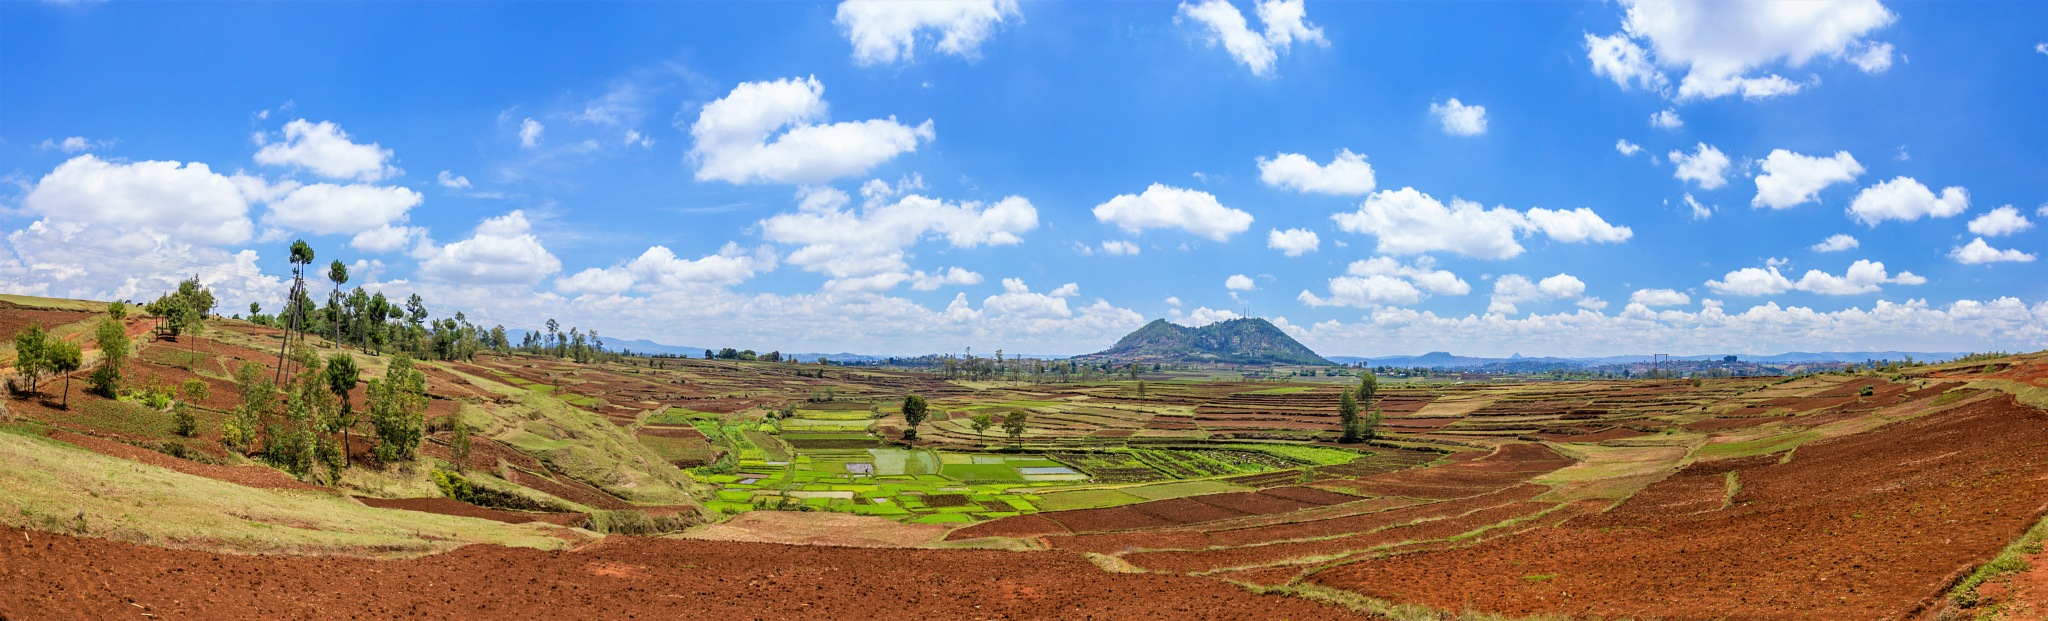 Paddy field, near Andsirabe, Madagascar by Nicolas F.